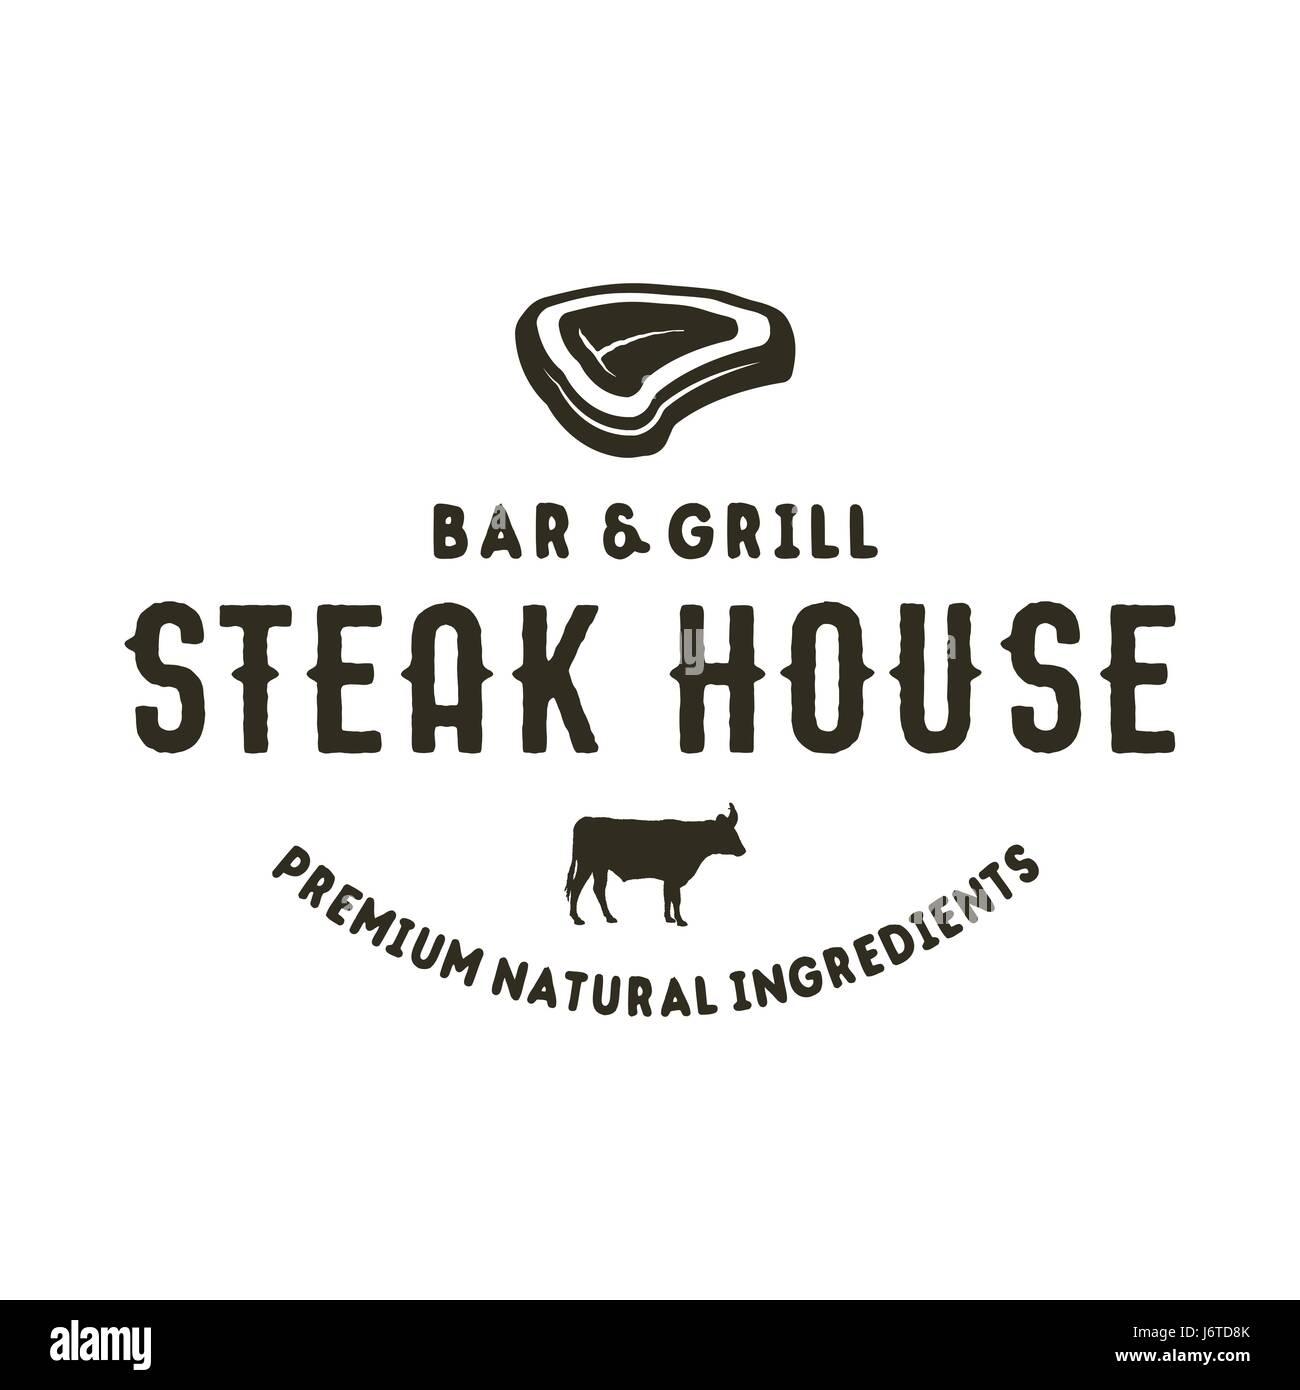 Steak house logo design. Bar and grill logotype, emblem ...